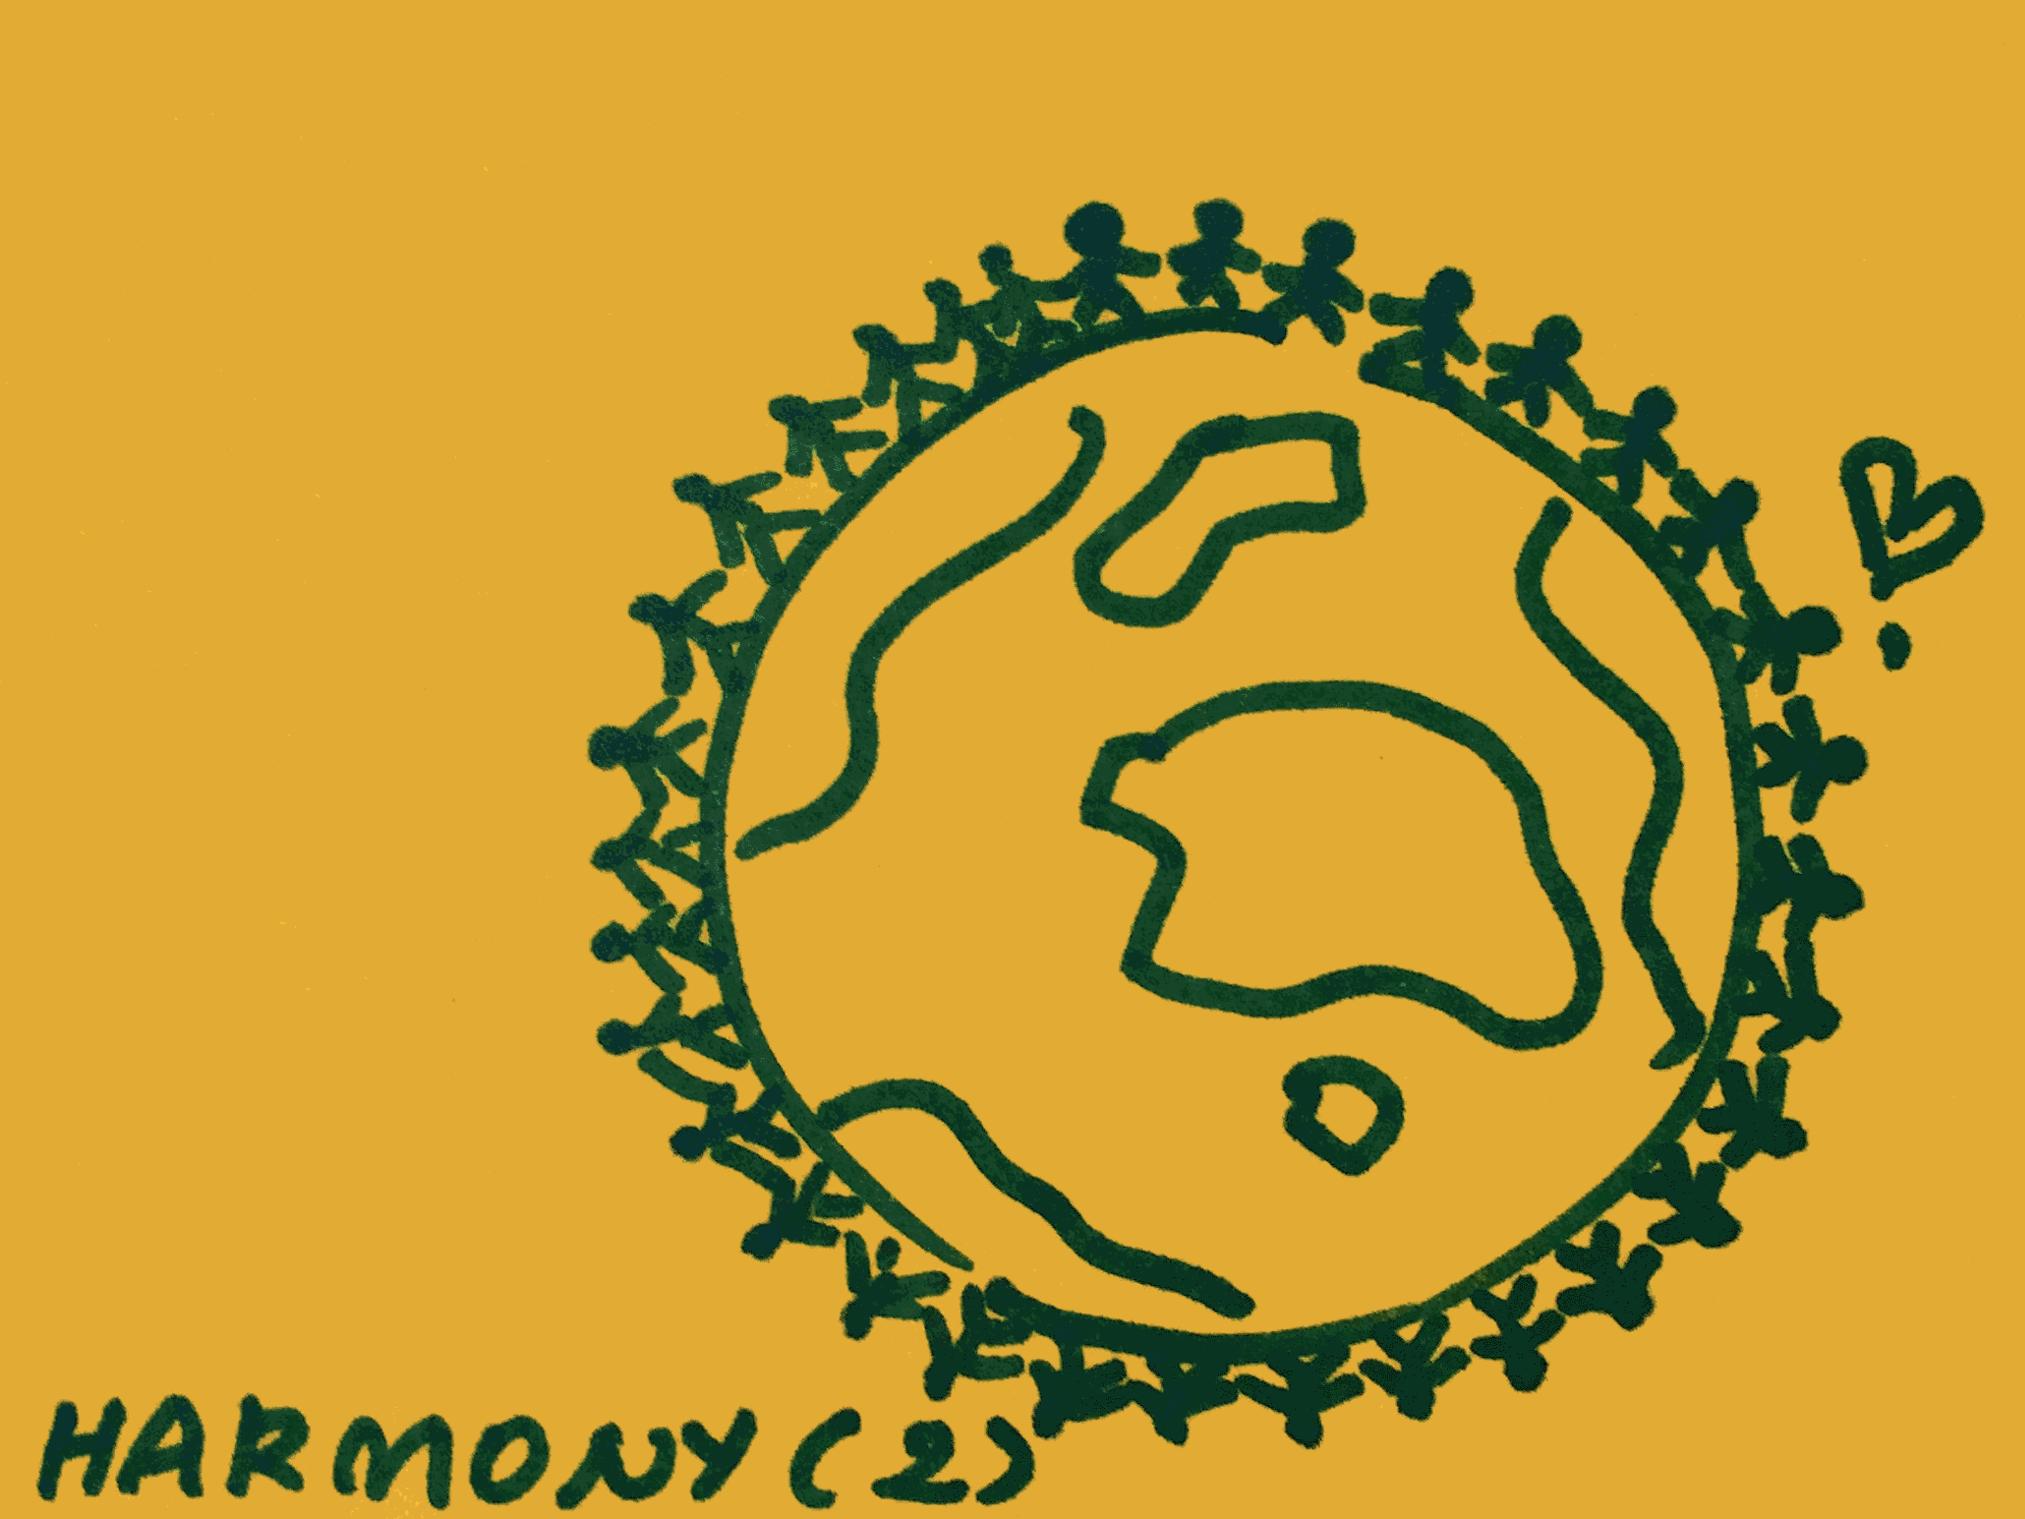 Harmony Strengthsfinder Happy Harmonious World